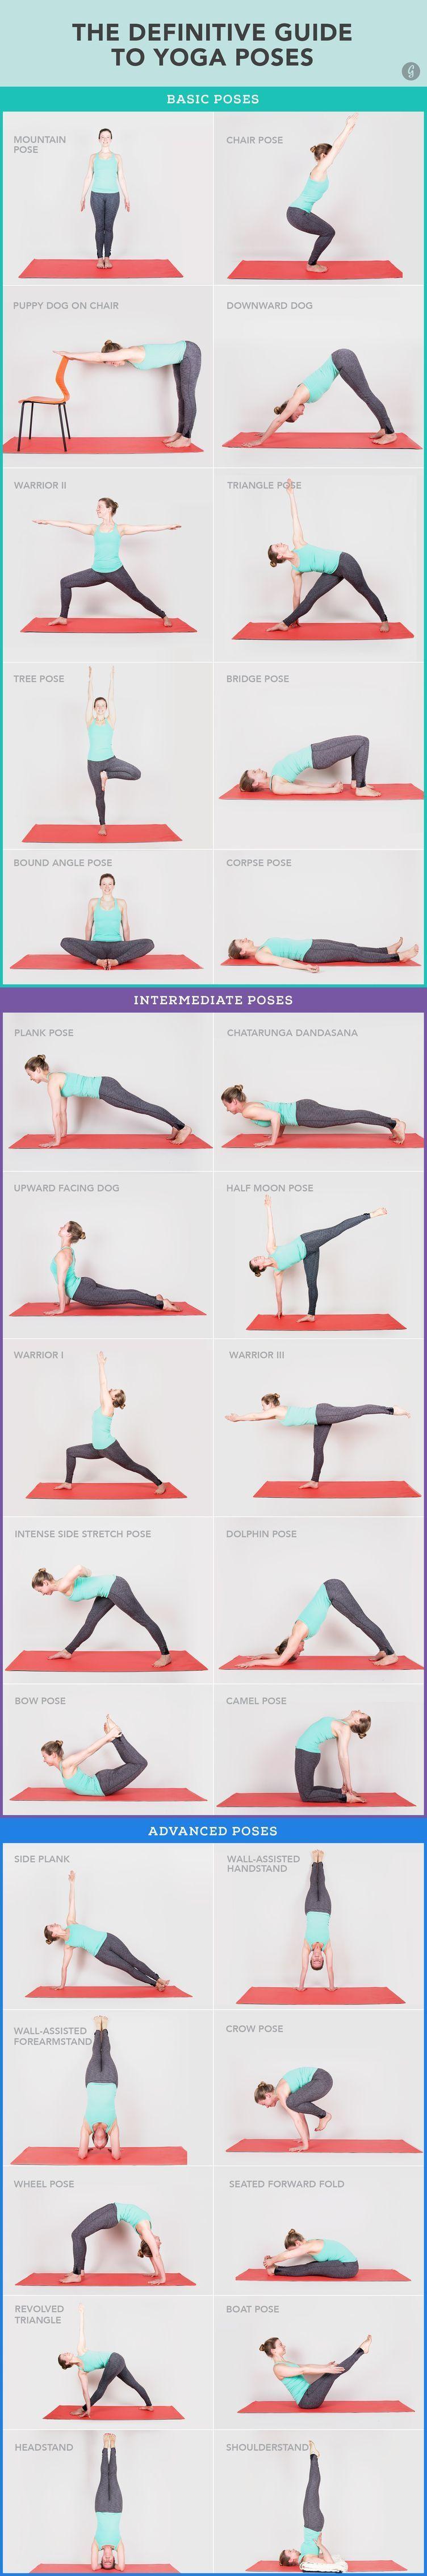 Basic Yoga Moves Cheat Sheet  30 Yoga Poses You Really Need To Know #yoga #stretch #fitness  #Basic...